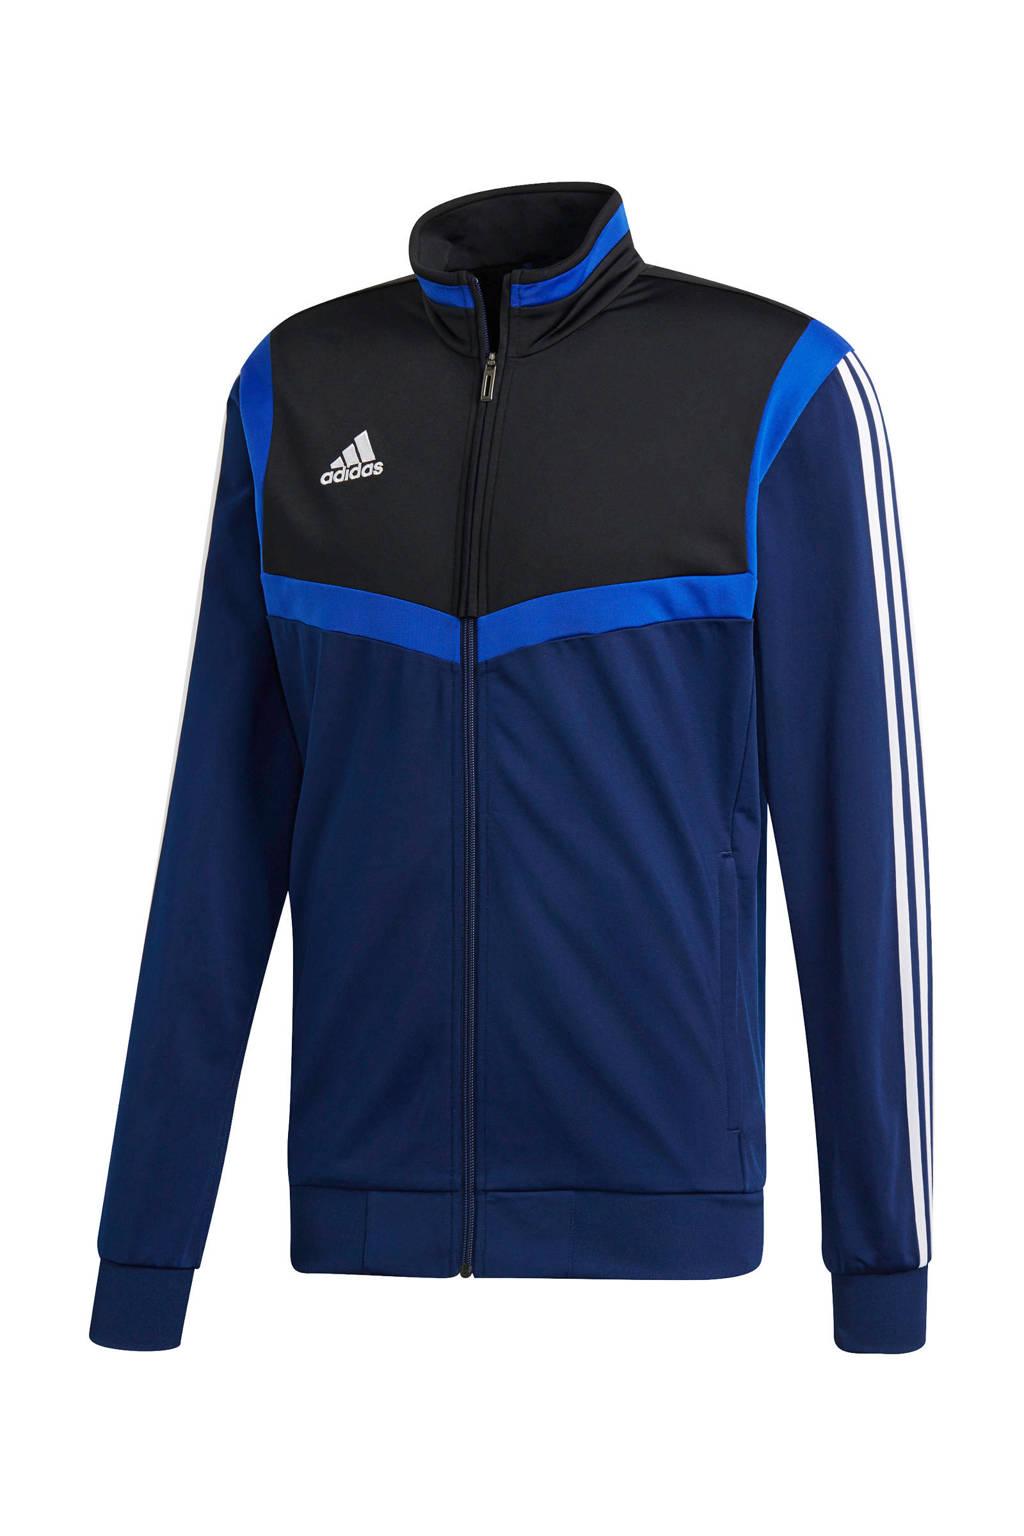 adidas performance   vest donkerblauw, Donkerblauw/blauw